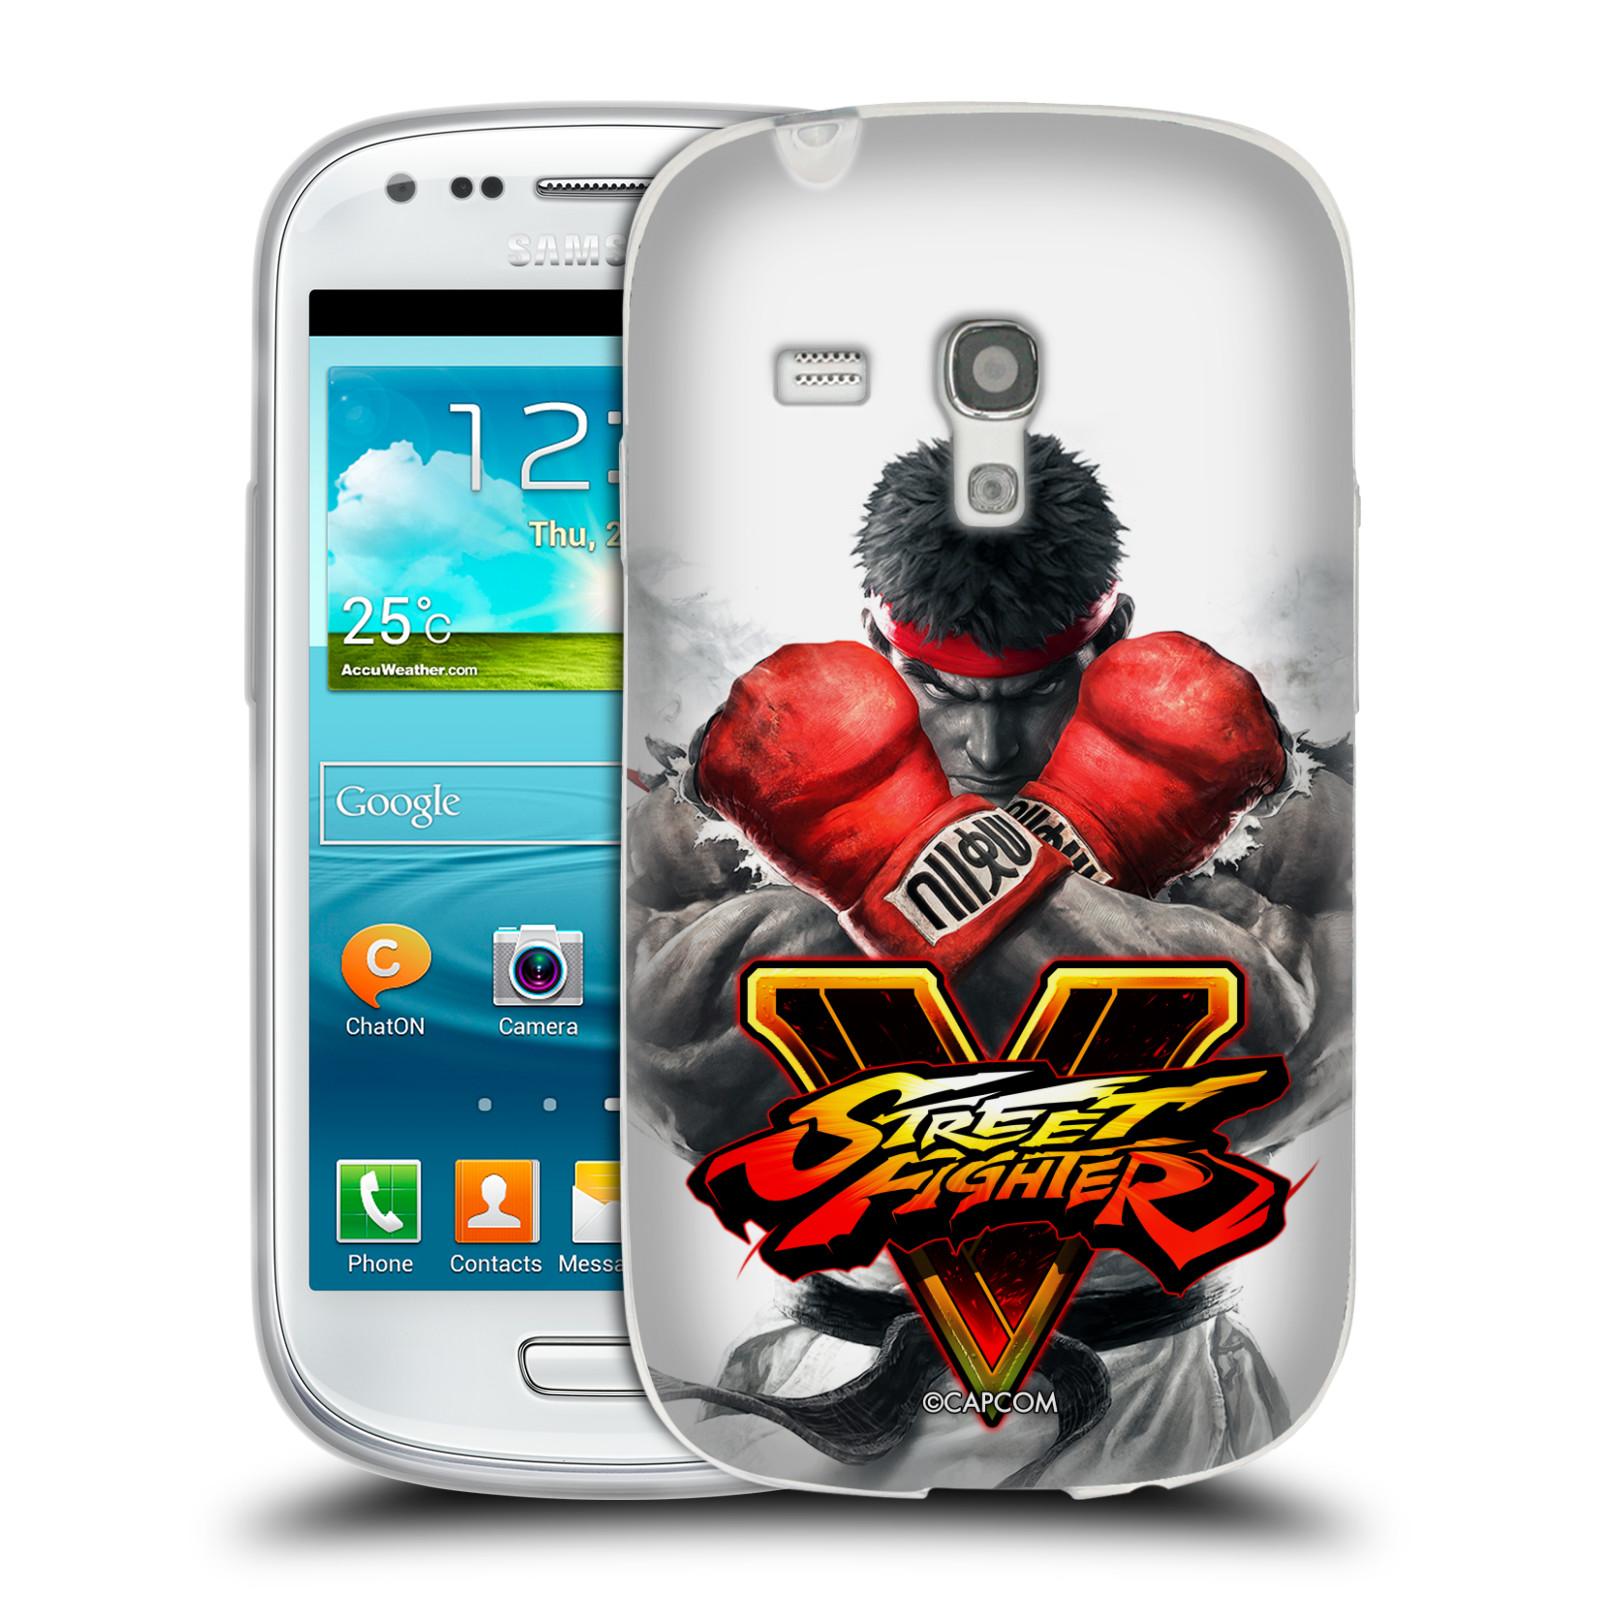 HEAD CASE silikonový obal na mobil Samsung Galaxy S3 MINI oficiální kryt STREET FIGHTER Boxer Ryu